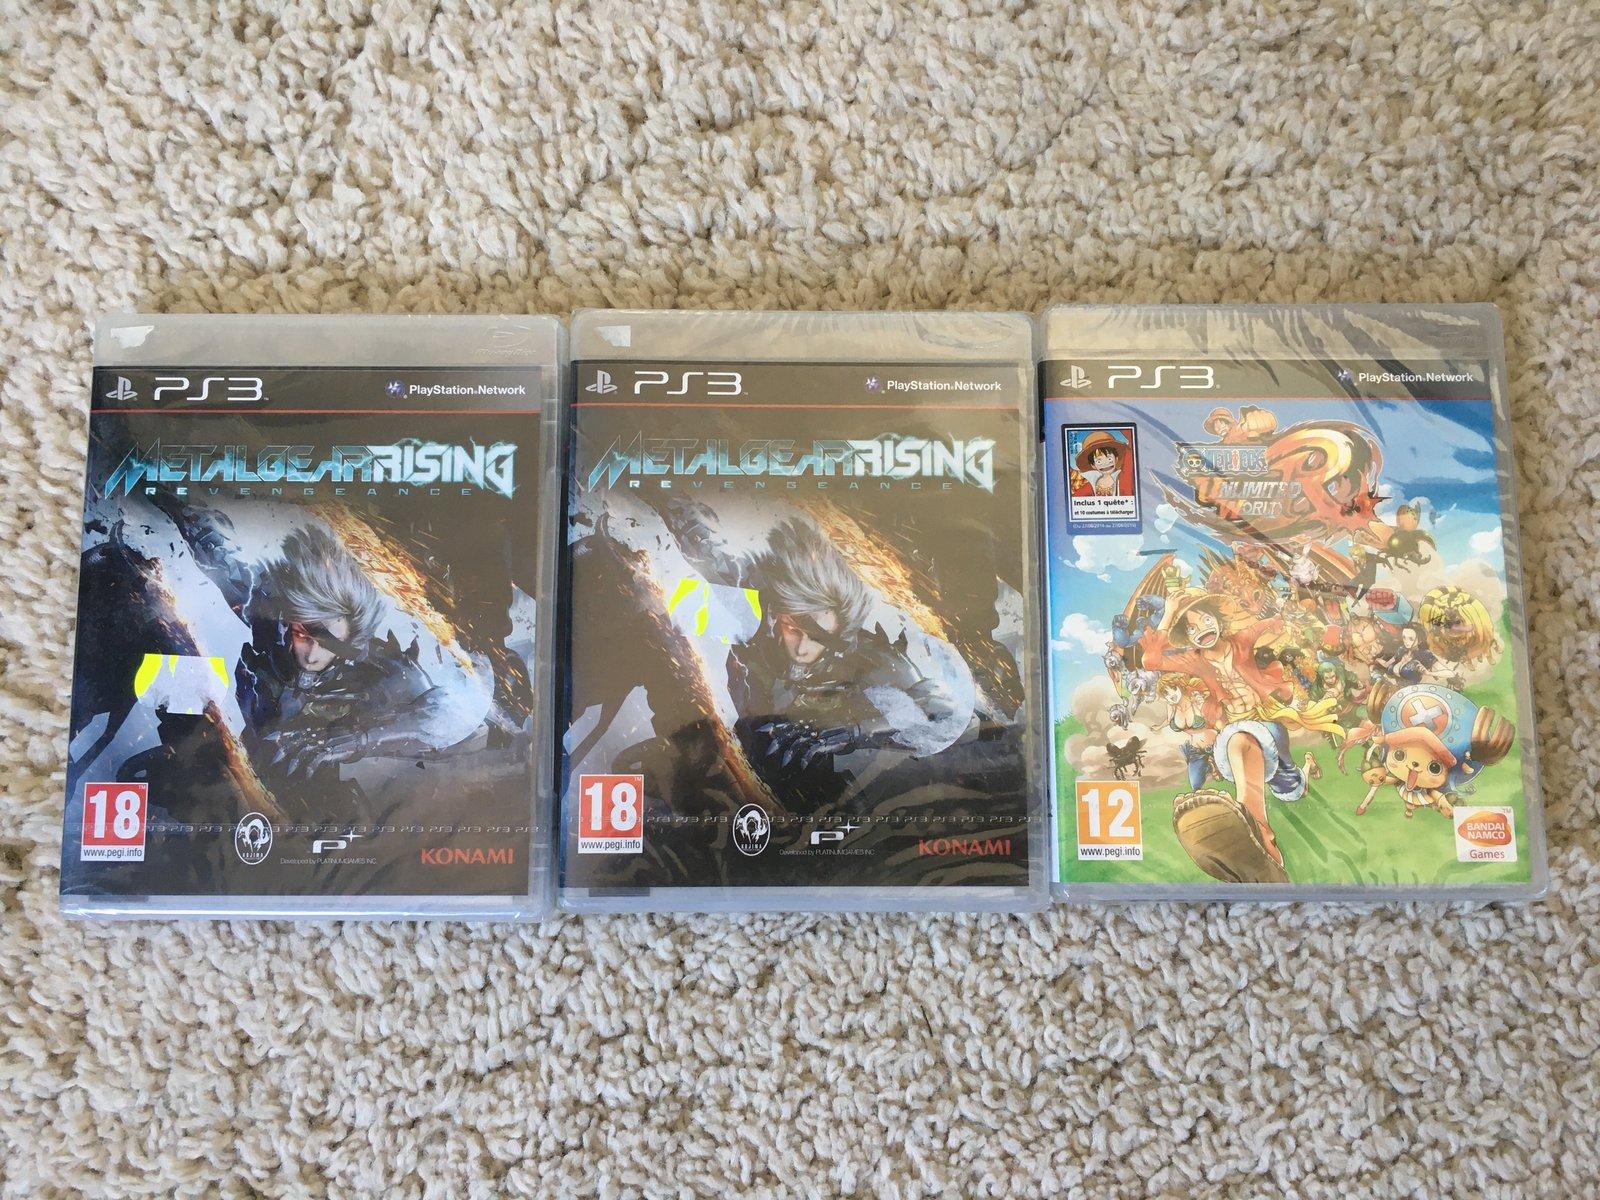 [VDS] Jeux PS3, PS2, Naruto Boruto collector PS4, VITA, matos PSOne MAJ 24/06/2020 200624101936667181